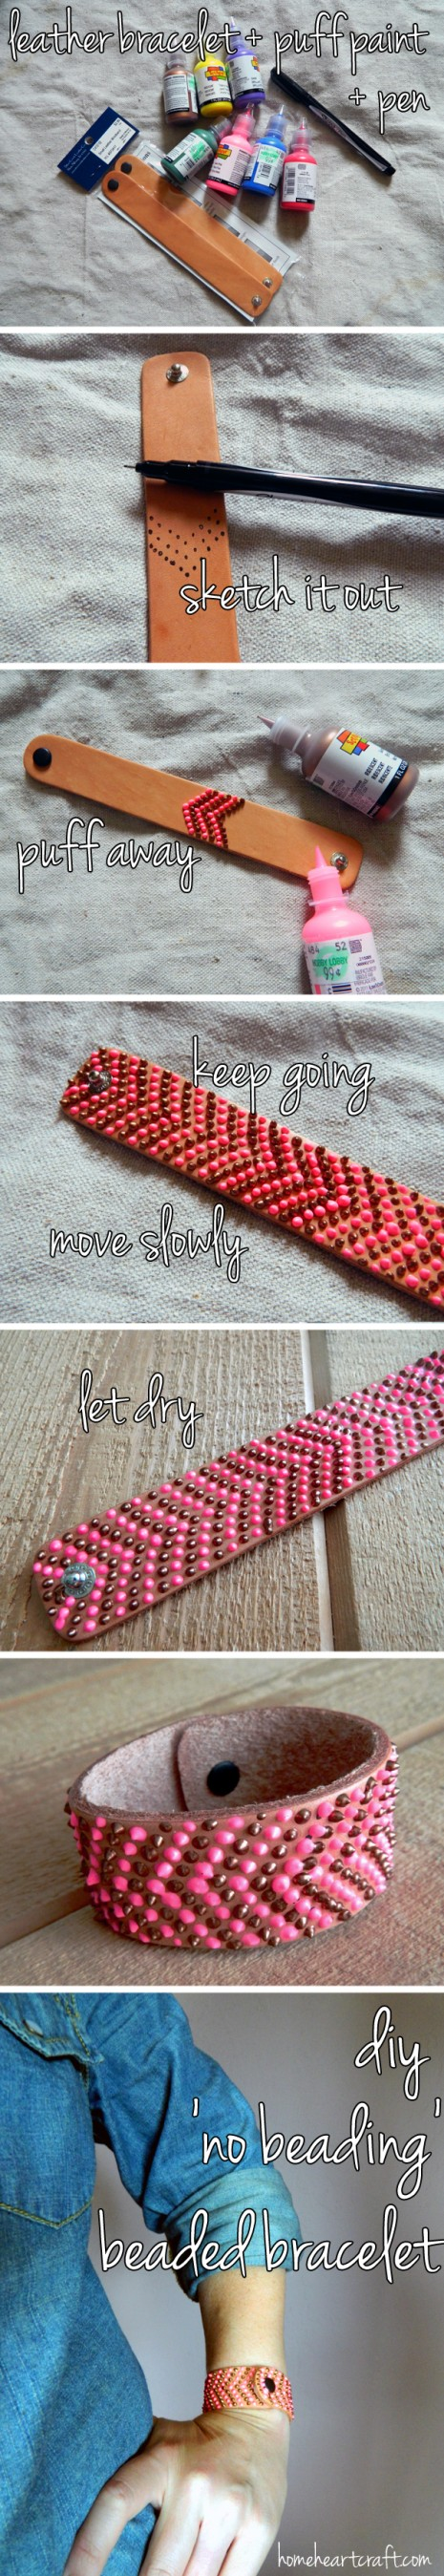 35655-Diy-No-Beading-Indian-Beaded-Bracelet